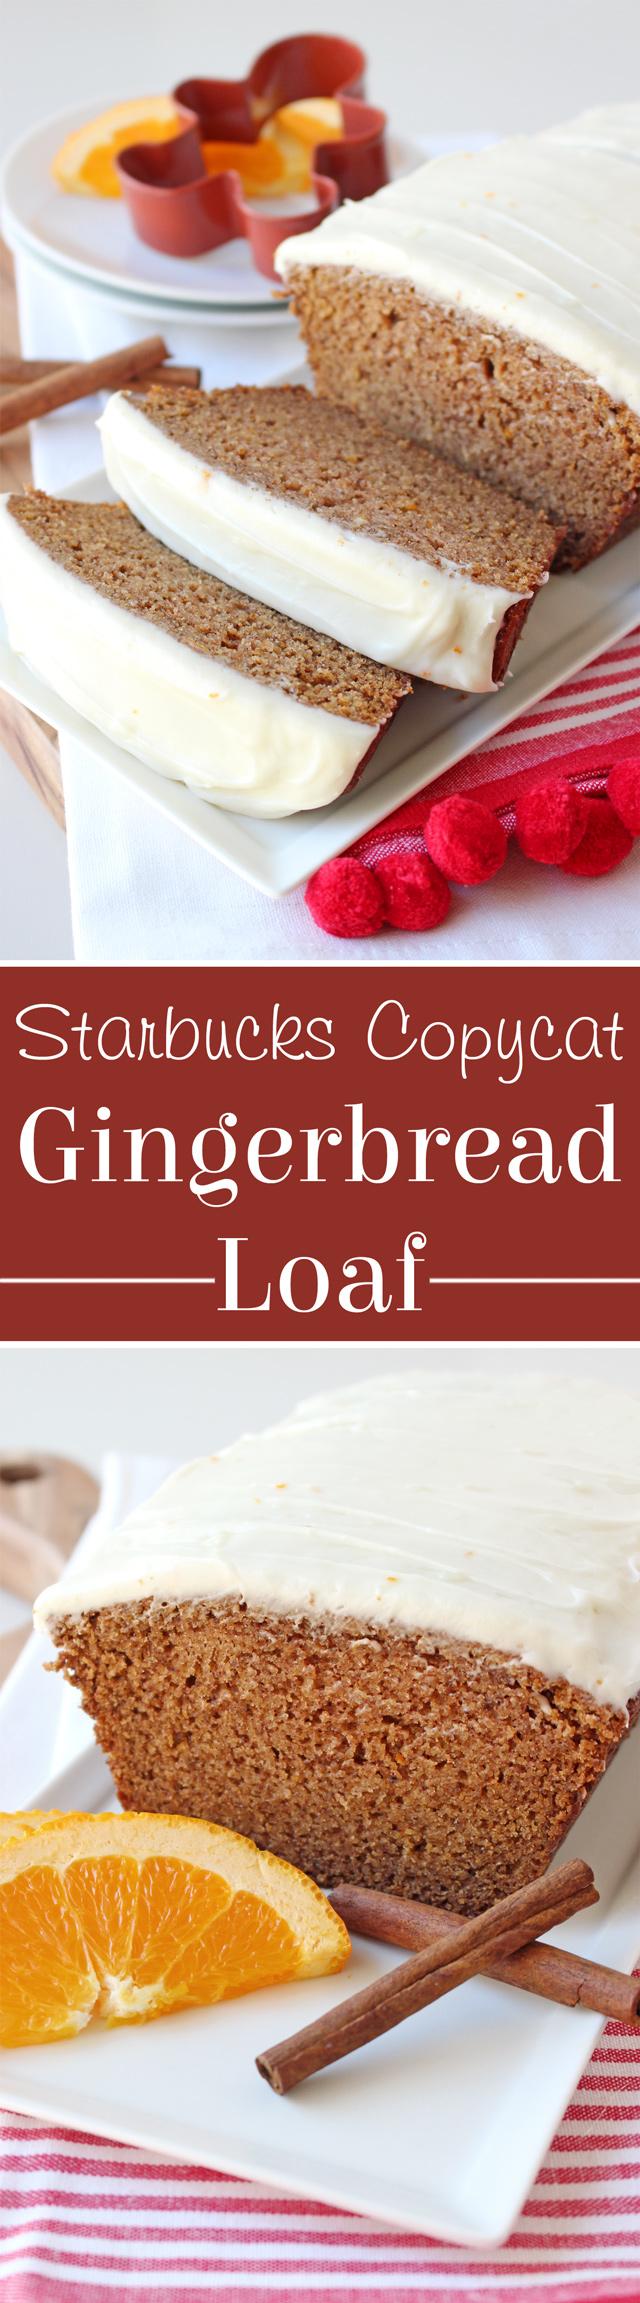 Gingerbread Loaf Recipe - Starbucks Copycat